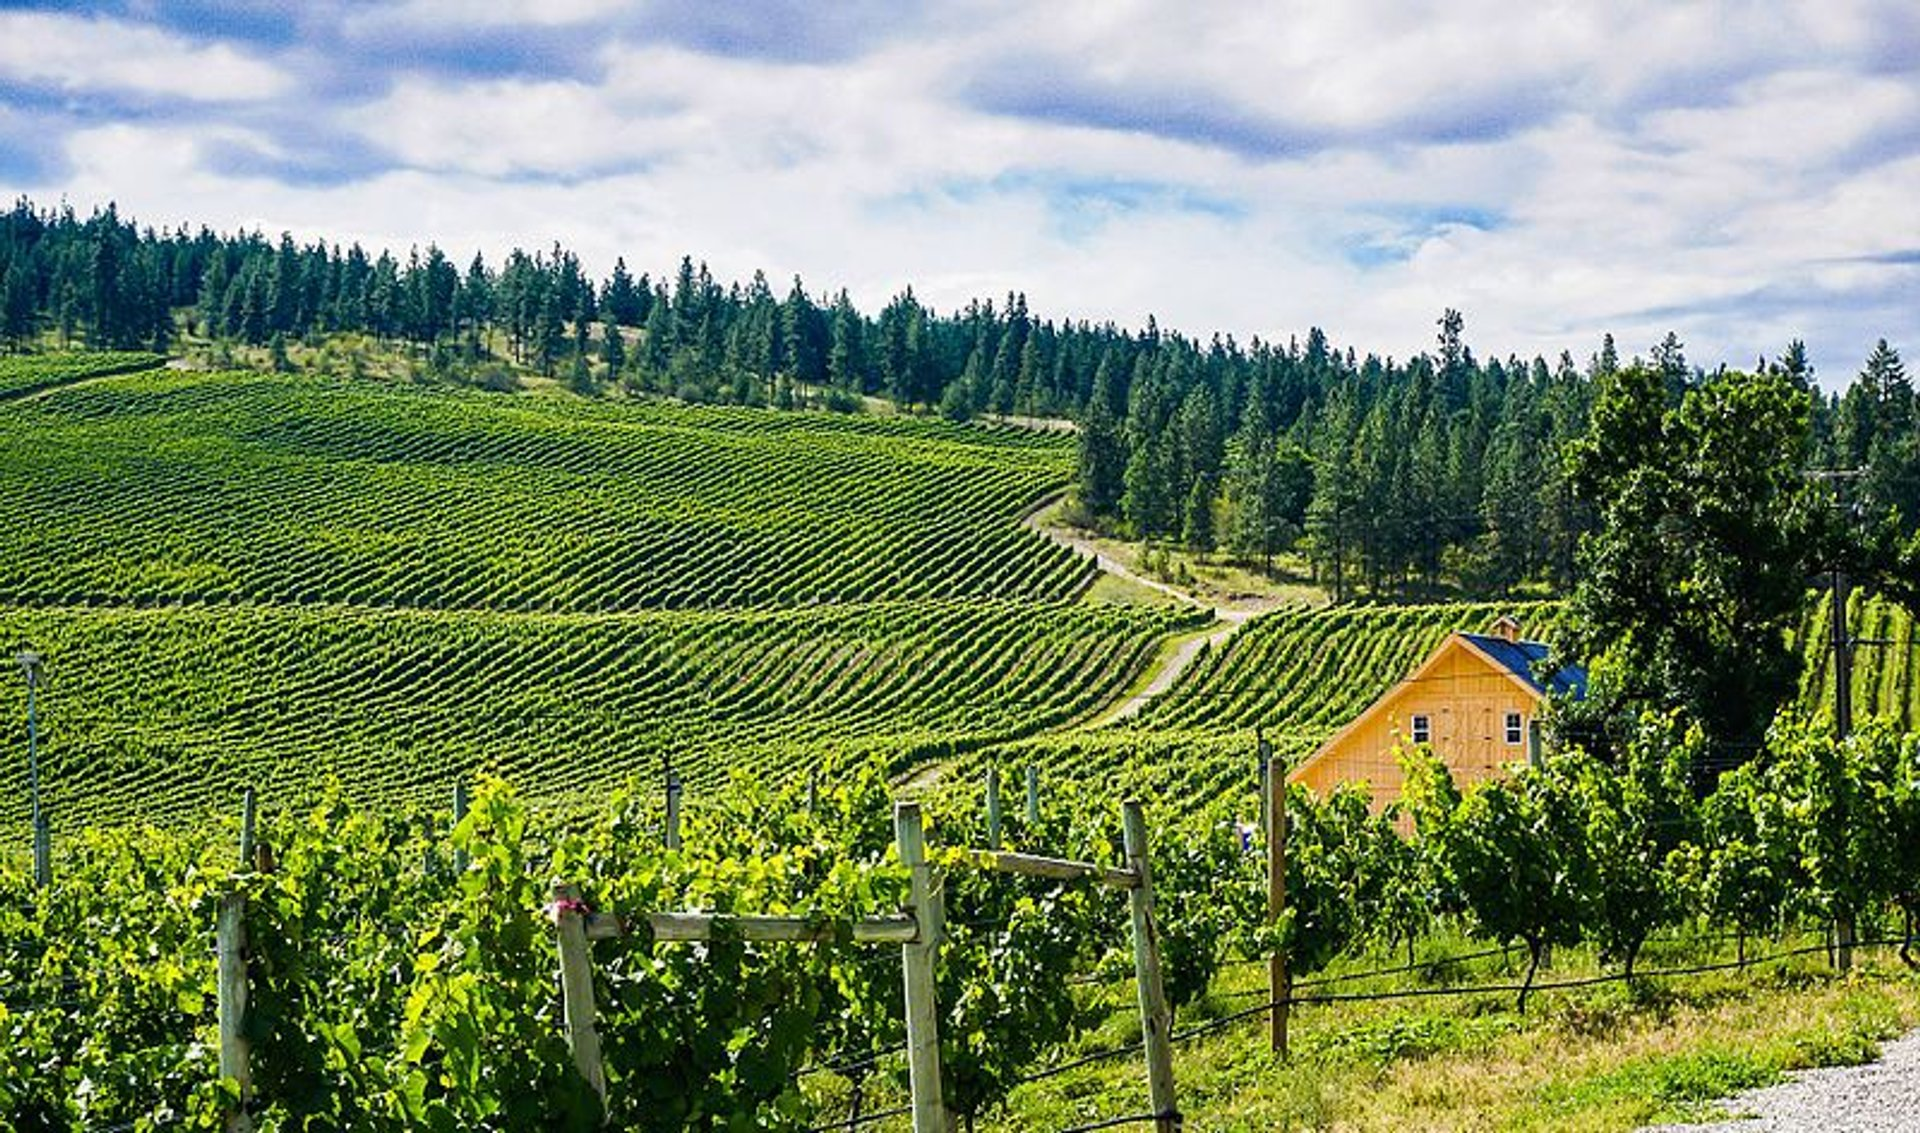 Okanagan Grape Harvest in British Columbia - Best Season 2020